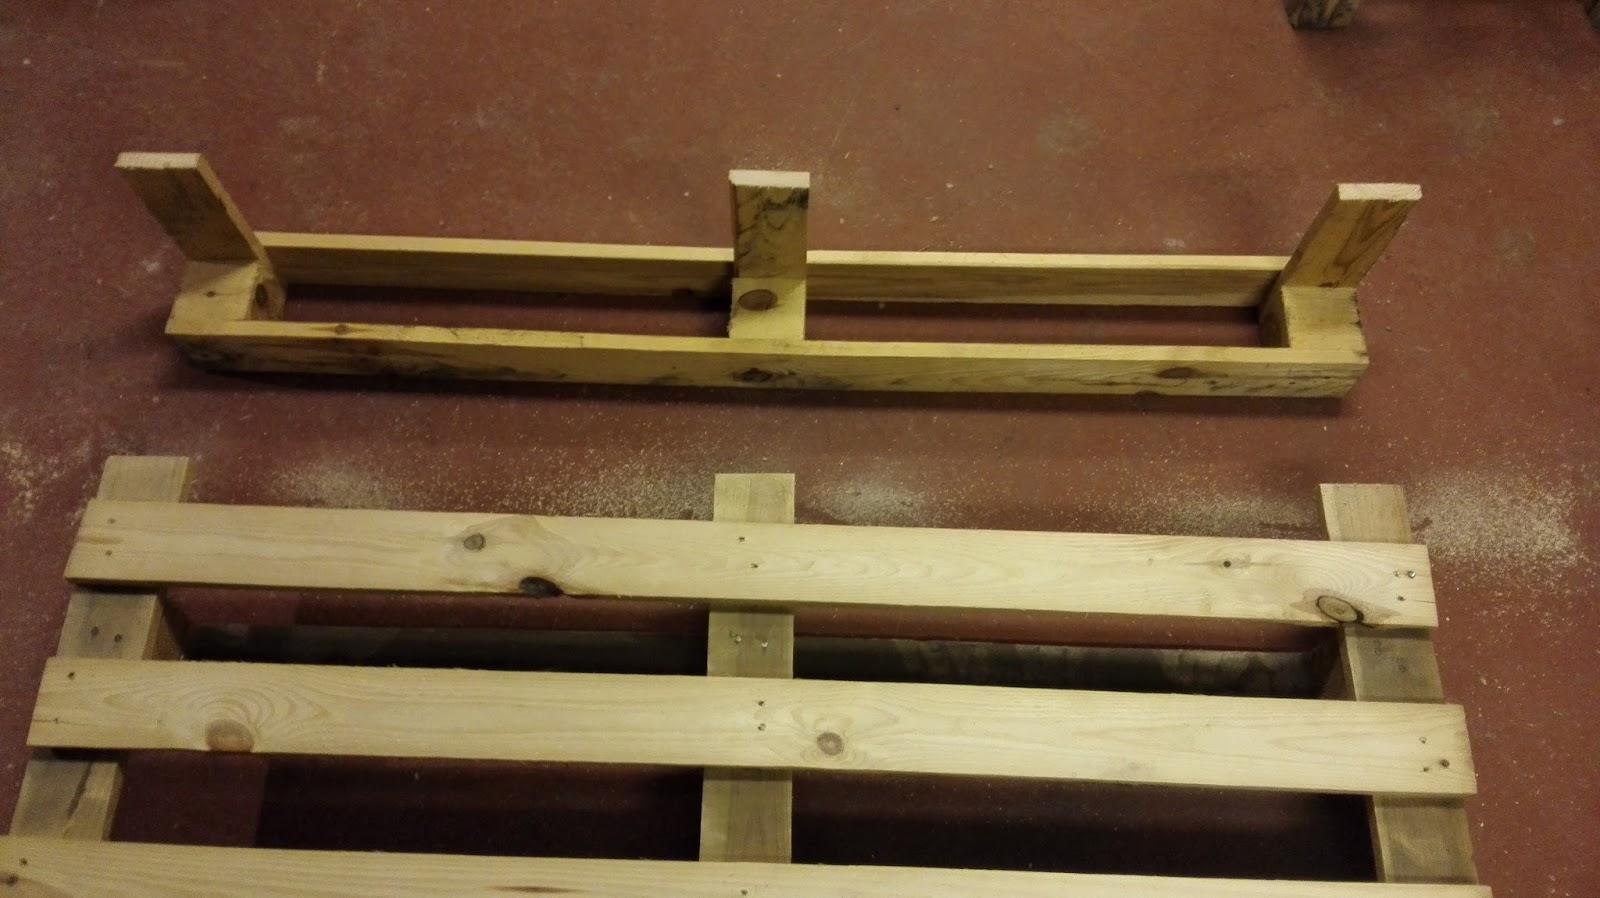 Diy anleitung shabby bar aus einweg palette die minibar f r die wand - Weinregal europalette anleitung ...